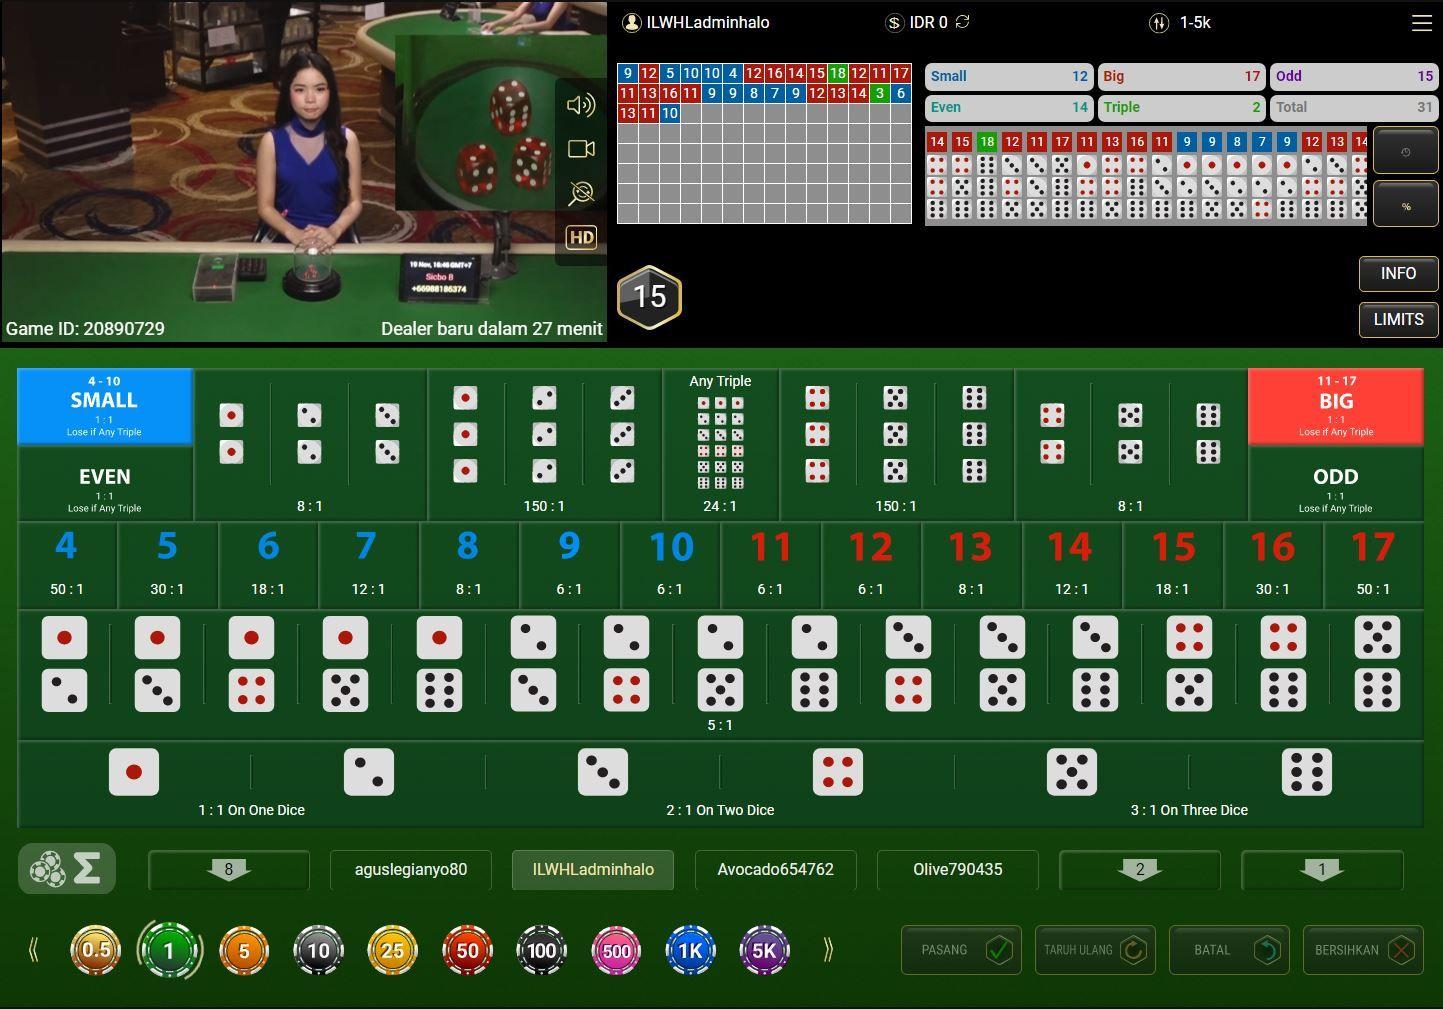 HALOTOTO LIVE GAME SICBO | Poker, Pelayan, Kartu